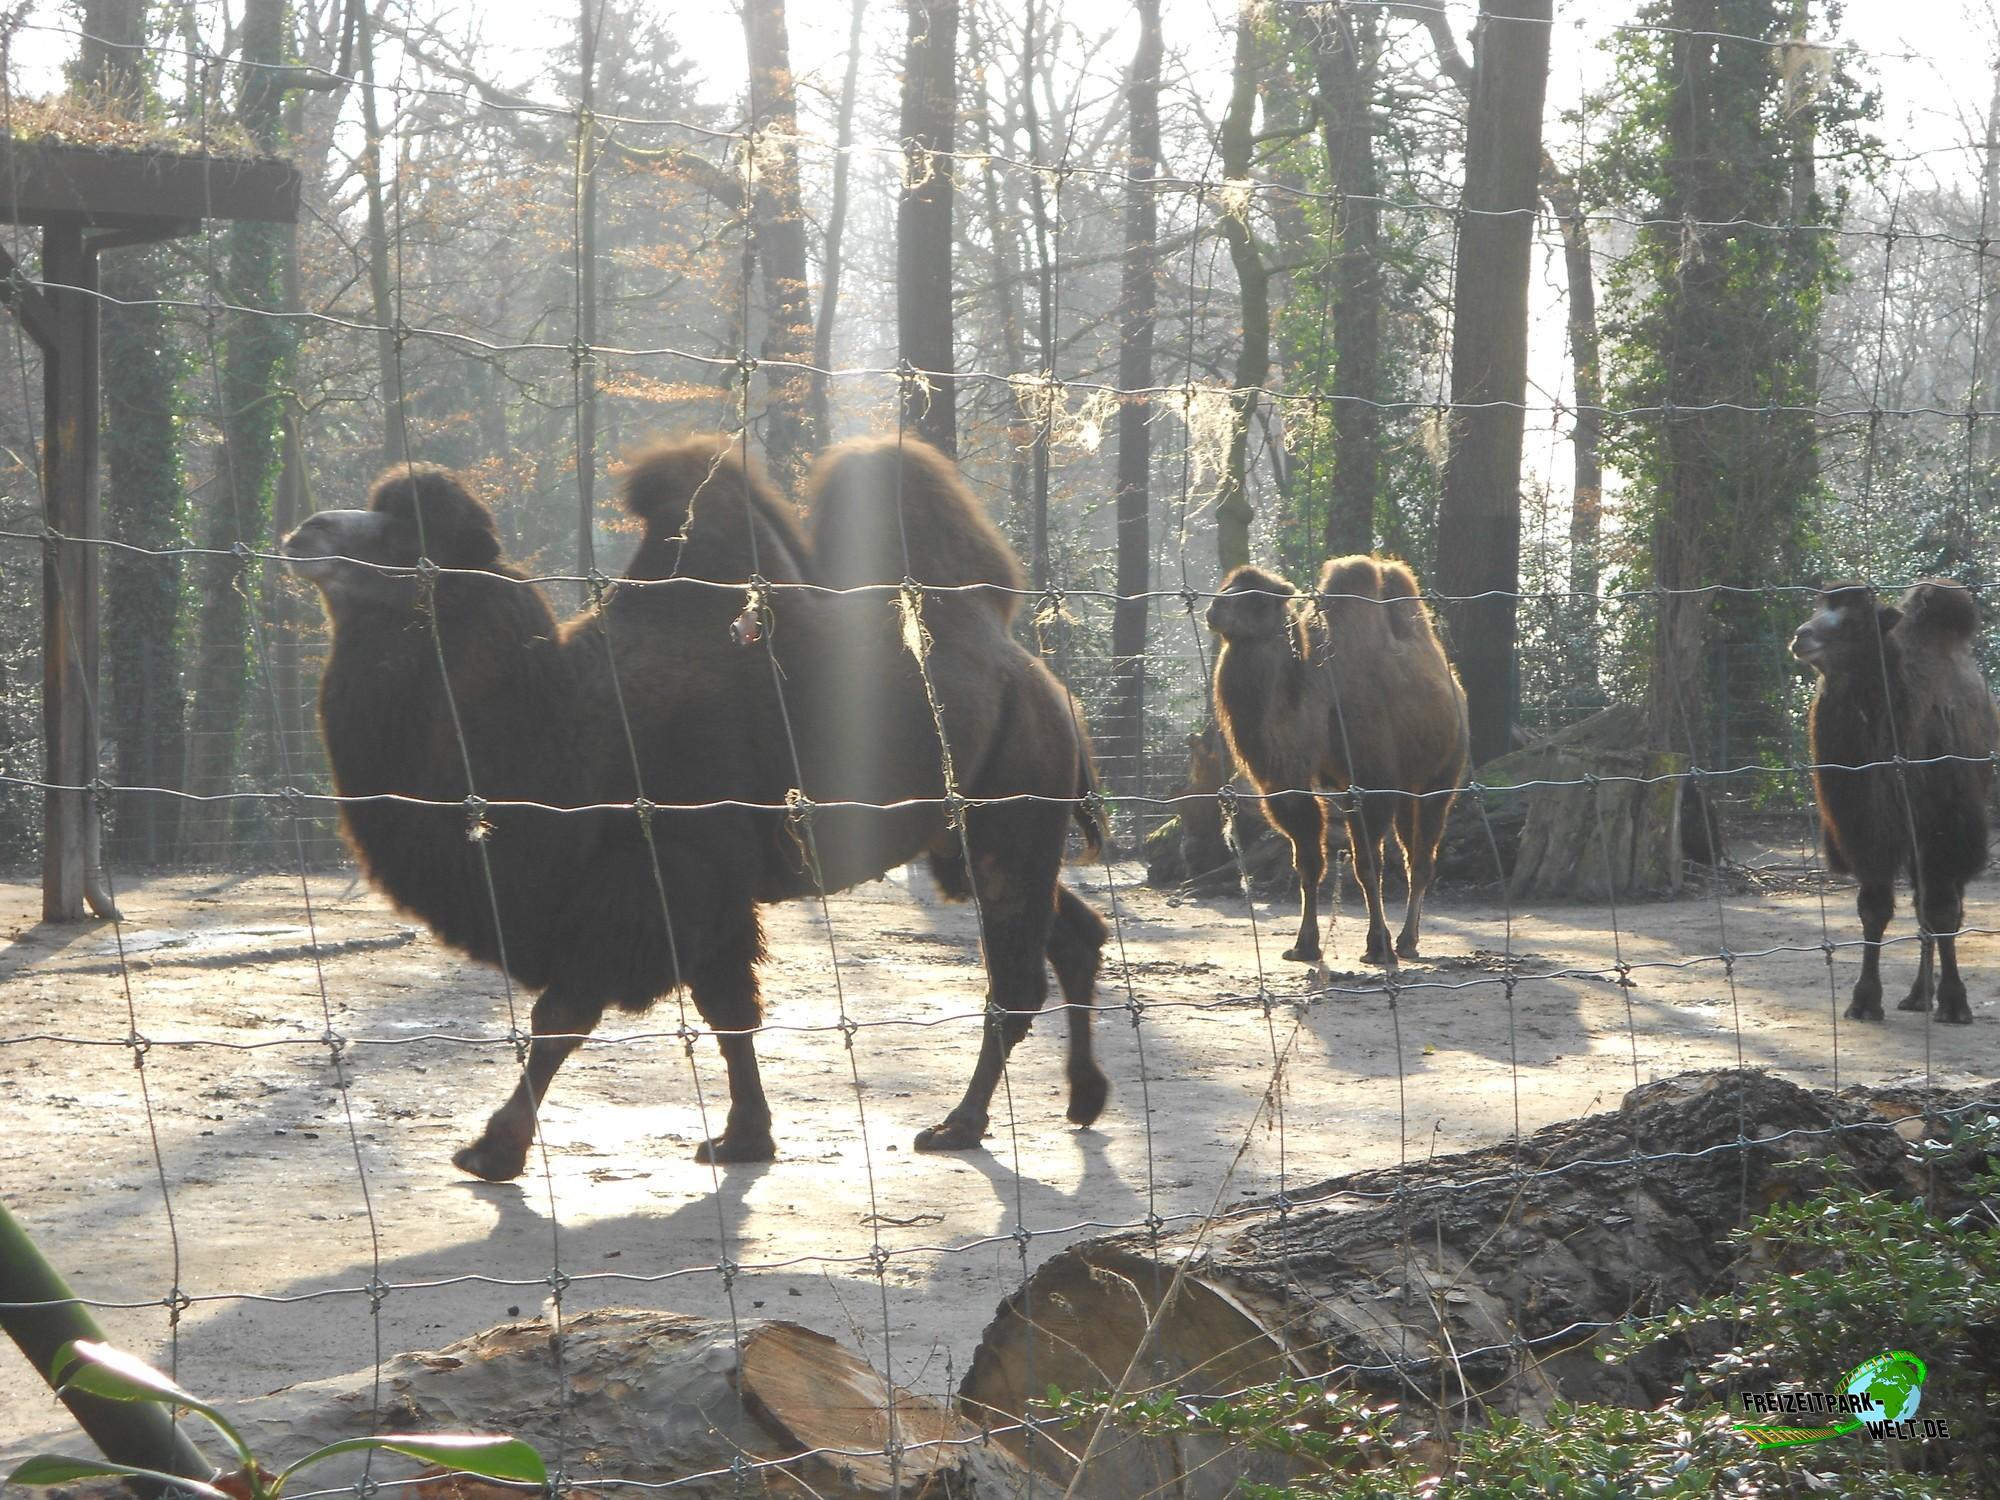 trampeltier zoo dortmund freizeitpark. Black Bedroom Furniture Sets. Home Design Ideas